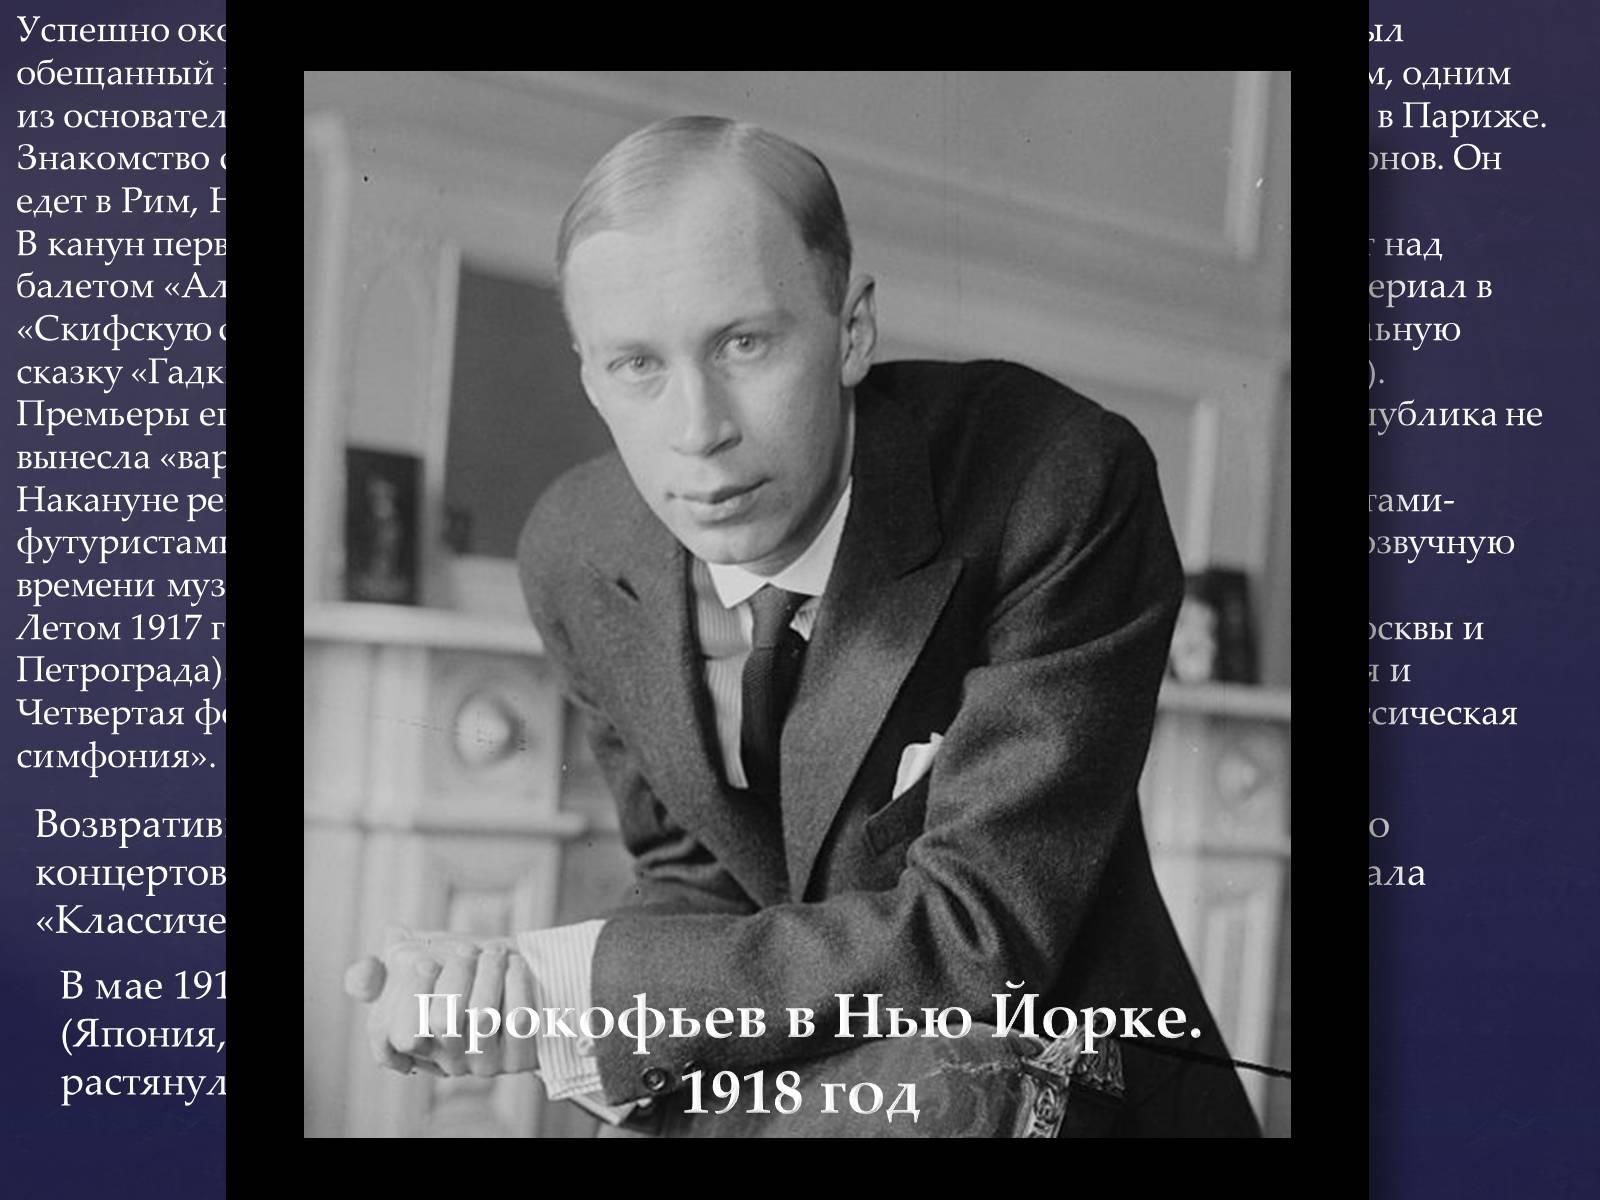 знакомство с композитором прокофьев